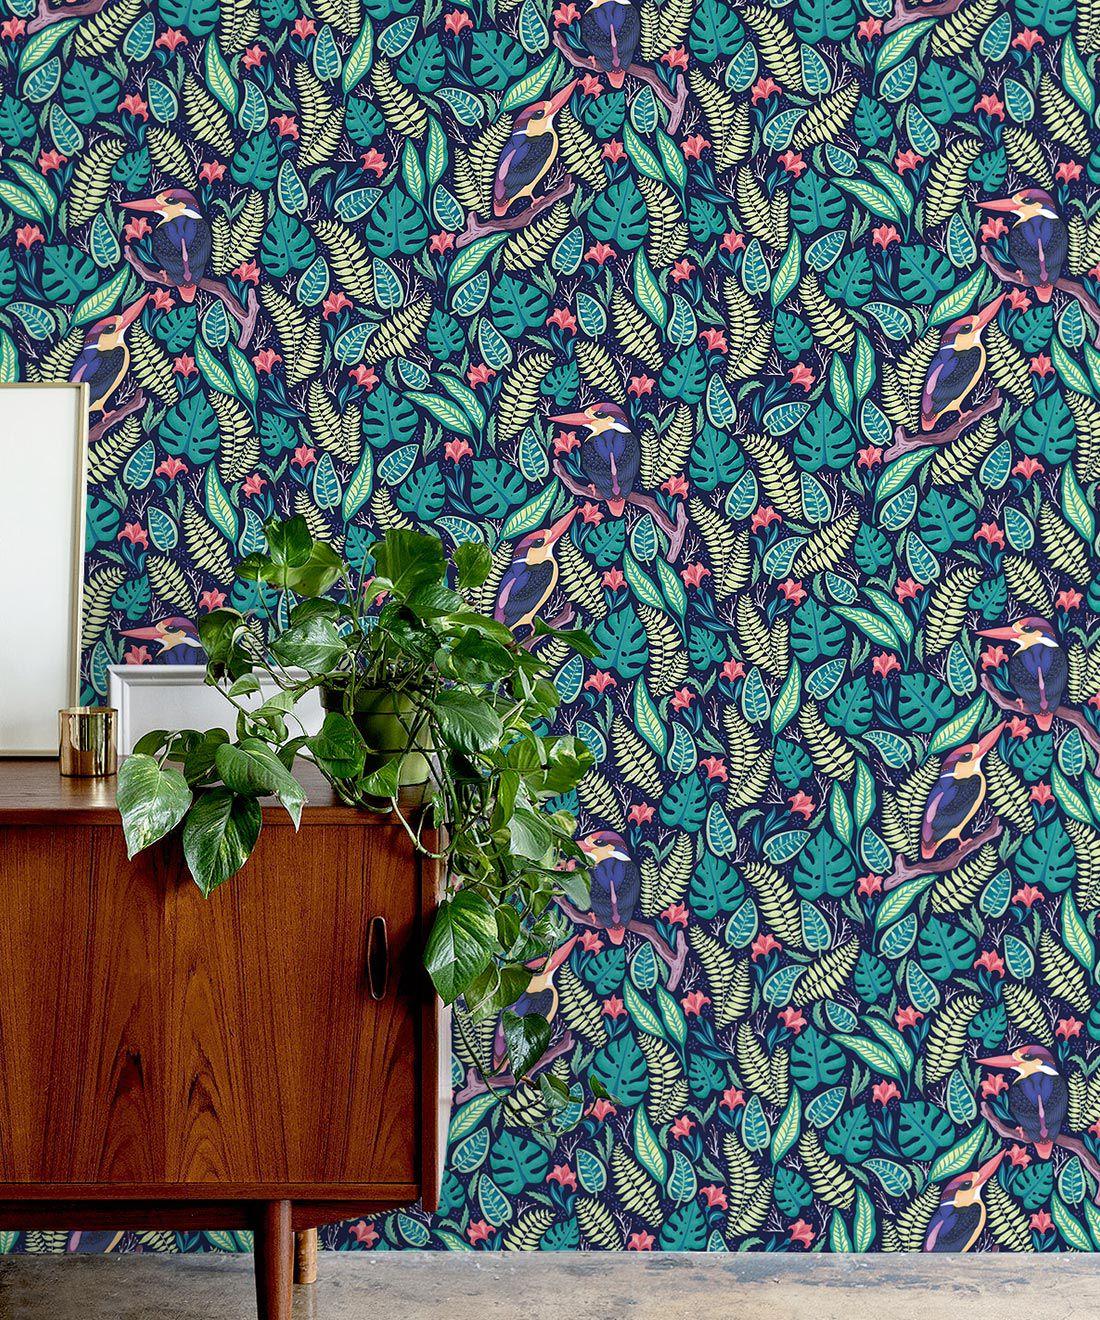 Kingfisher Wallpaper • Bird Wallpaper • Bright Neon Wallpaper Insitu